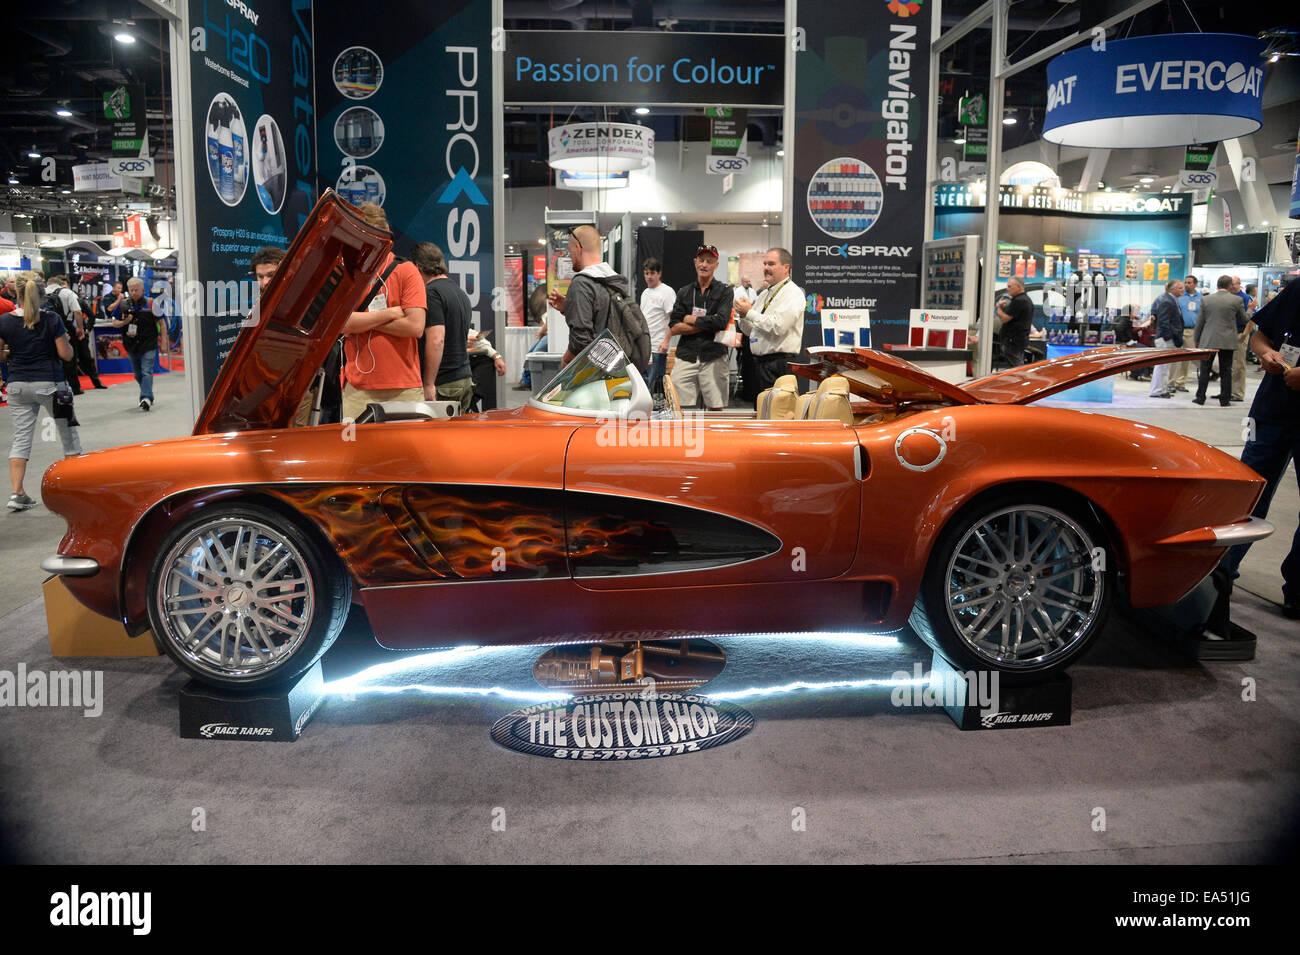 Las Vegas, Nevada, USA. 6th November, 2014. One of the many custom ...